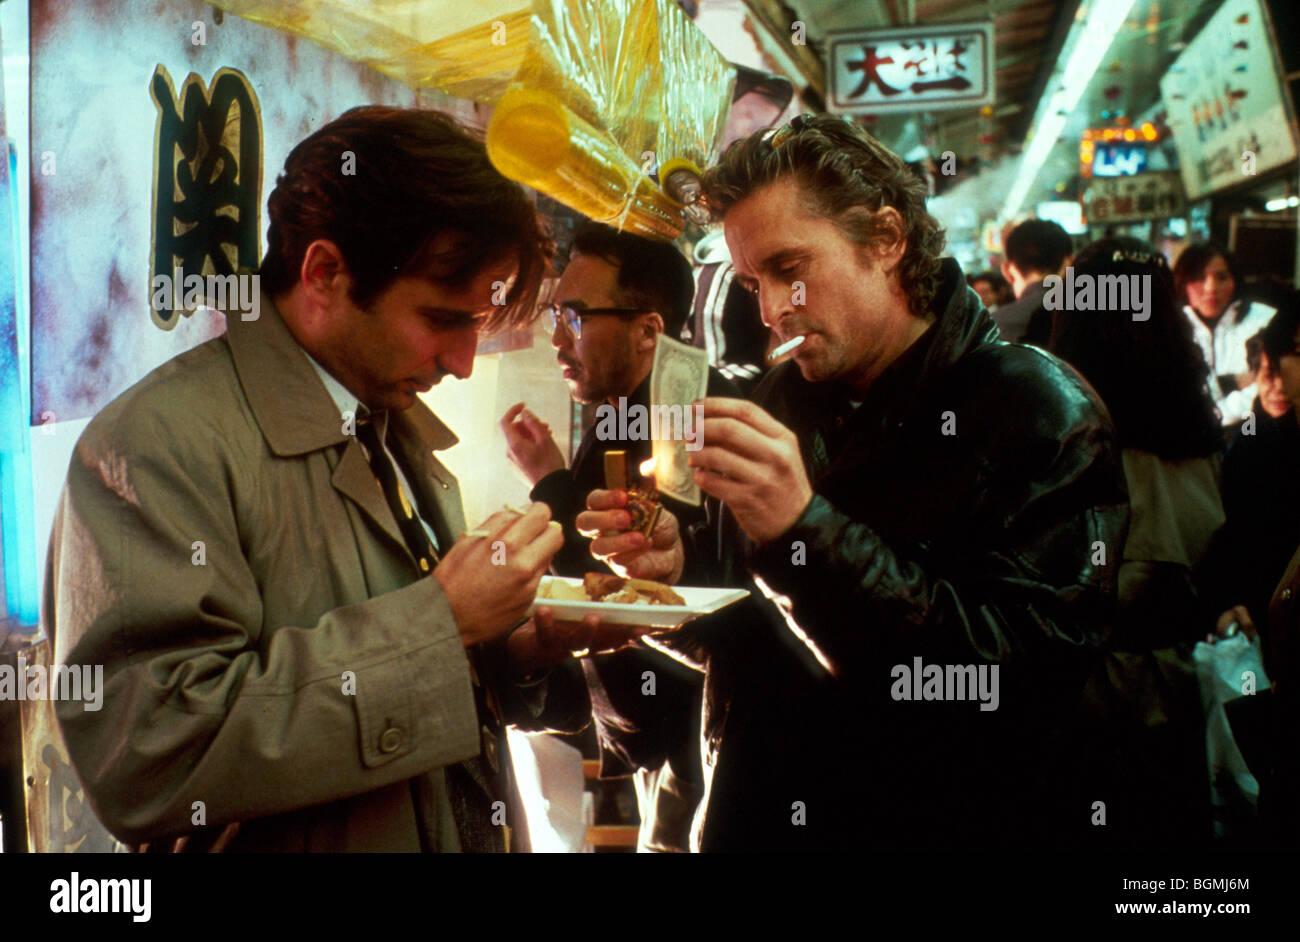 Black Rain Year : 1989 Director : Ridley Scott Andy Garcia, Michael Douglas - Stock Image